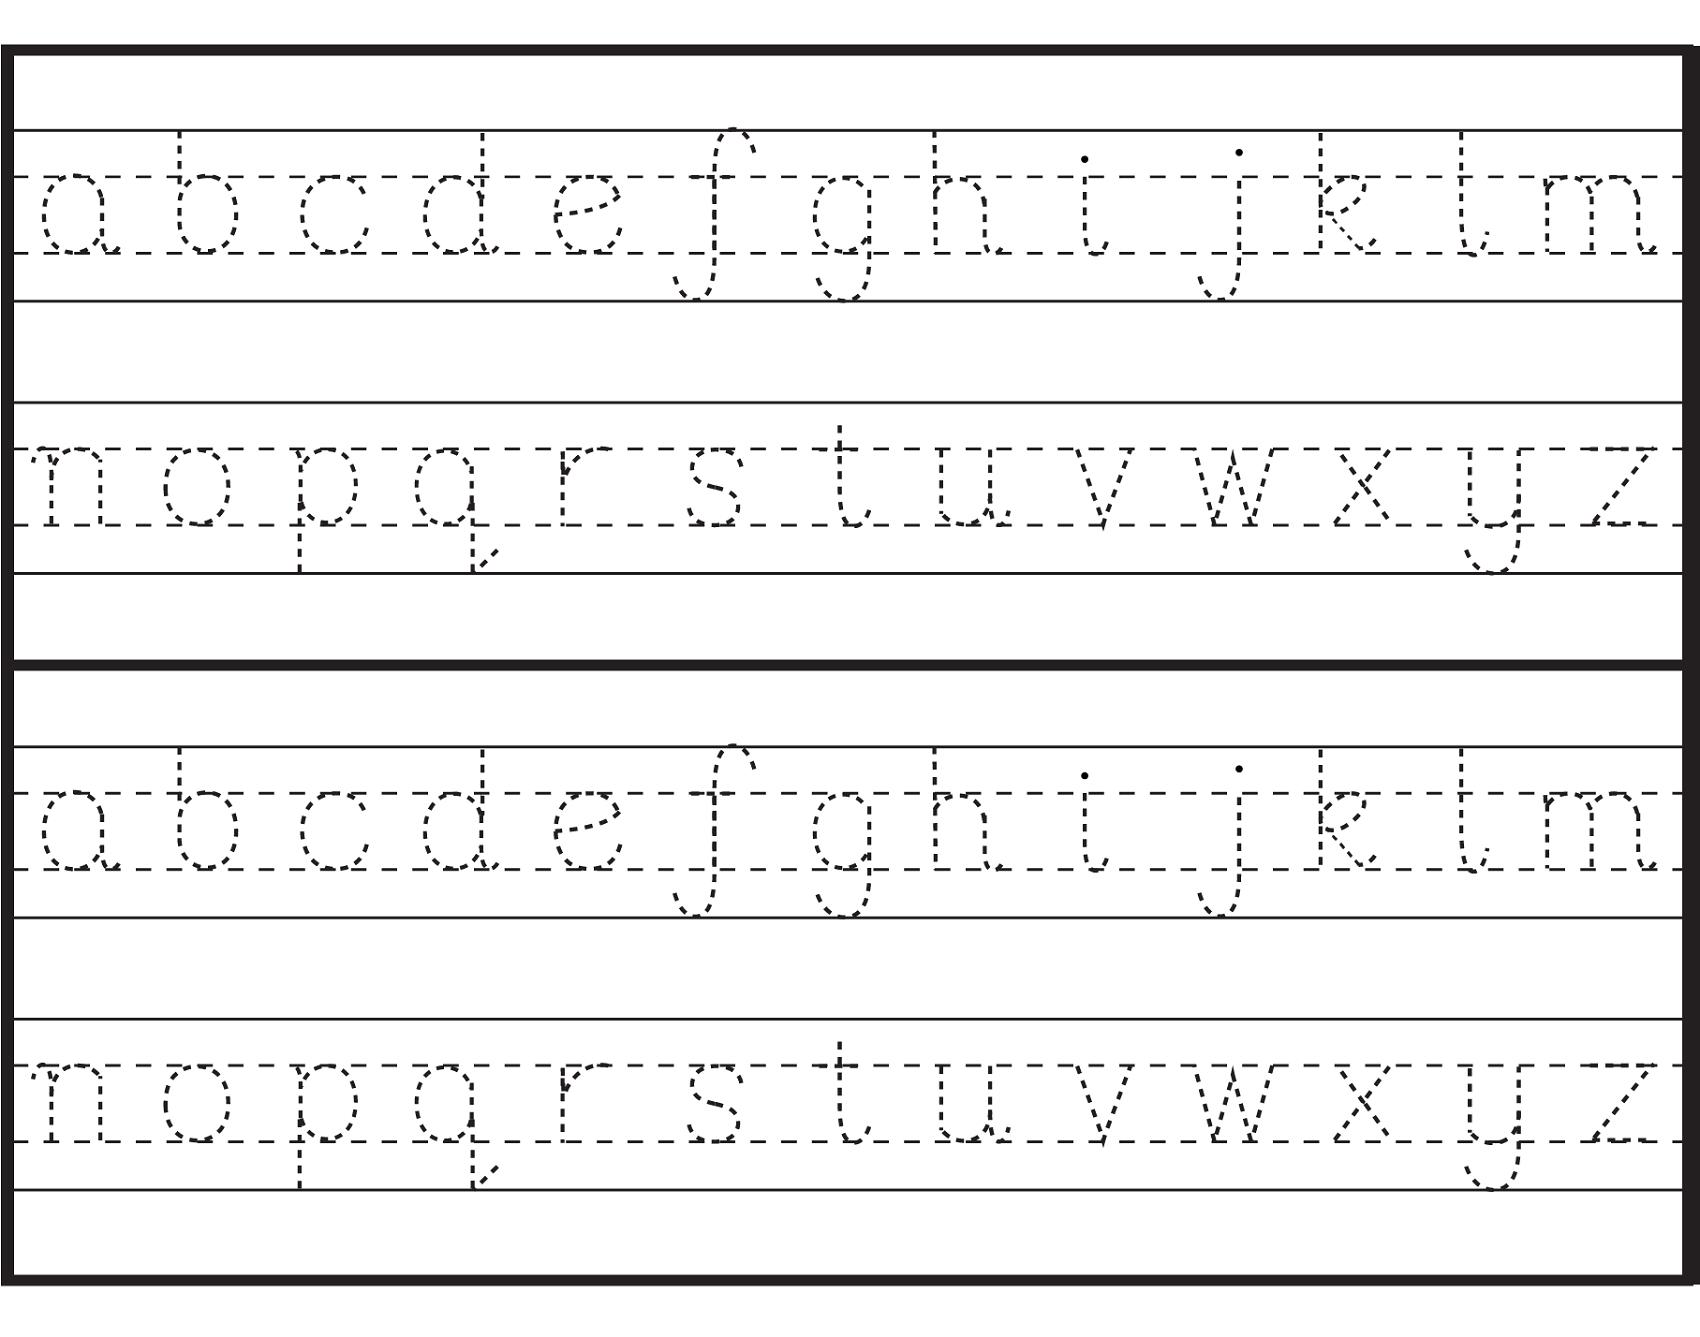 Alphabet Worksheets For Kindergarten Z Worksheetfun Az regarding Tracing Lowercase Letters Az